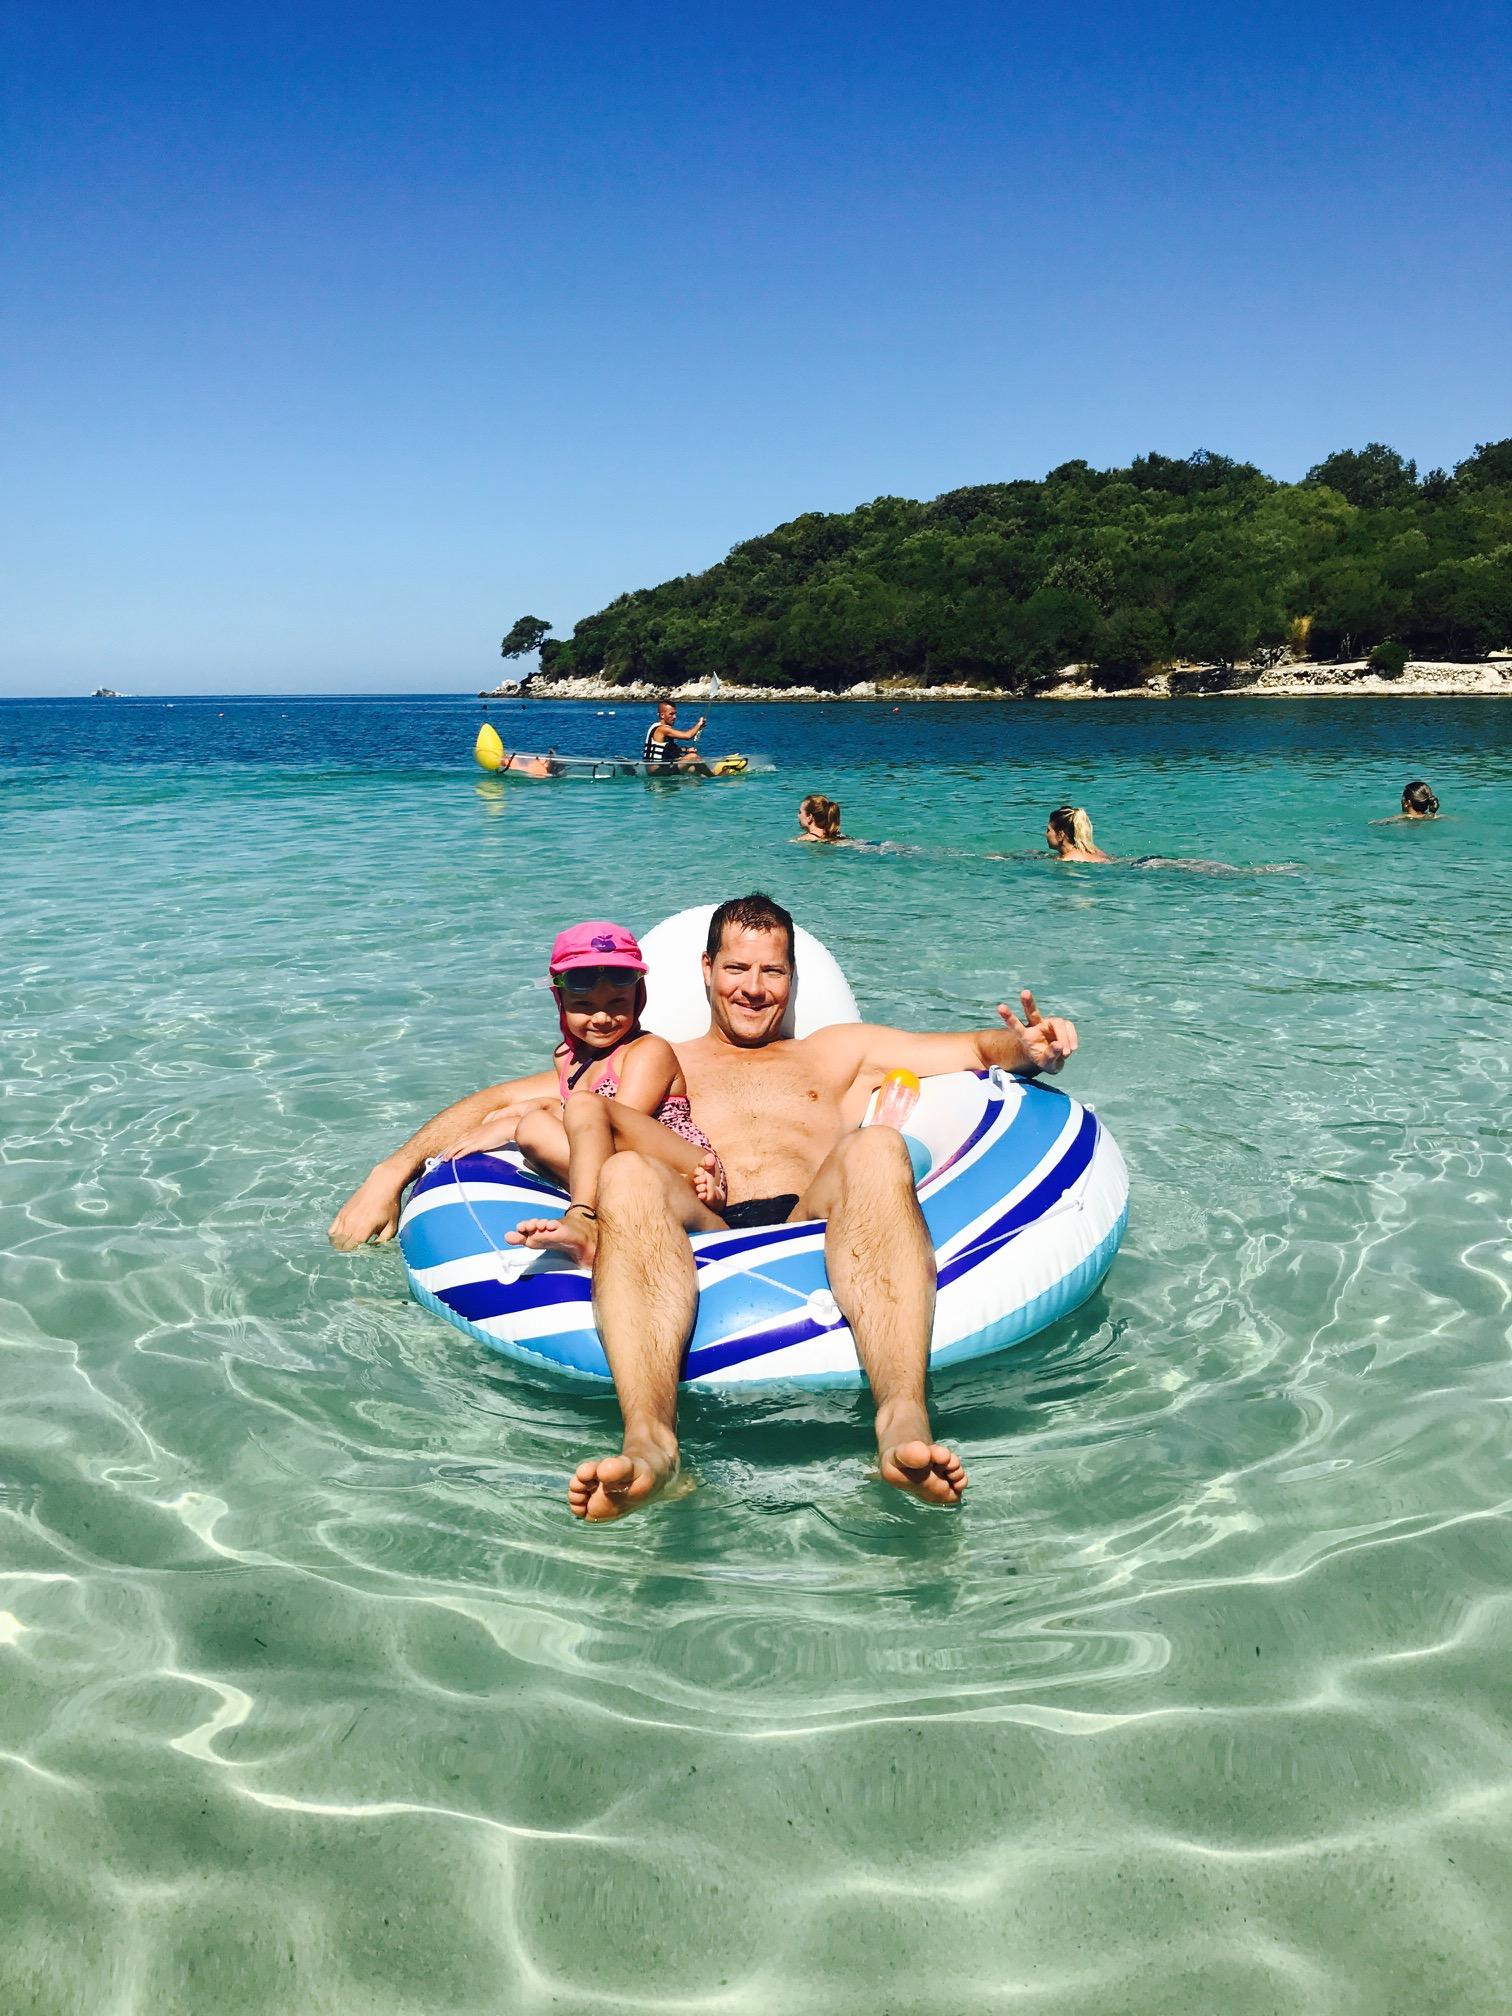 Vater und Tocher im Meer am Strand an der Tre Shuit Bar, Ksamil Beach, Albanien